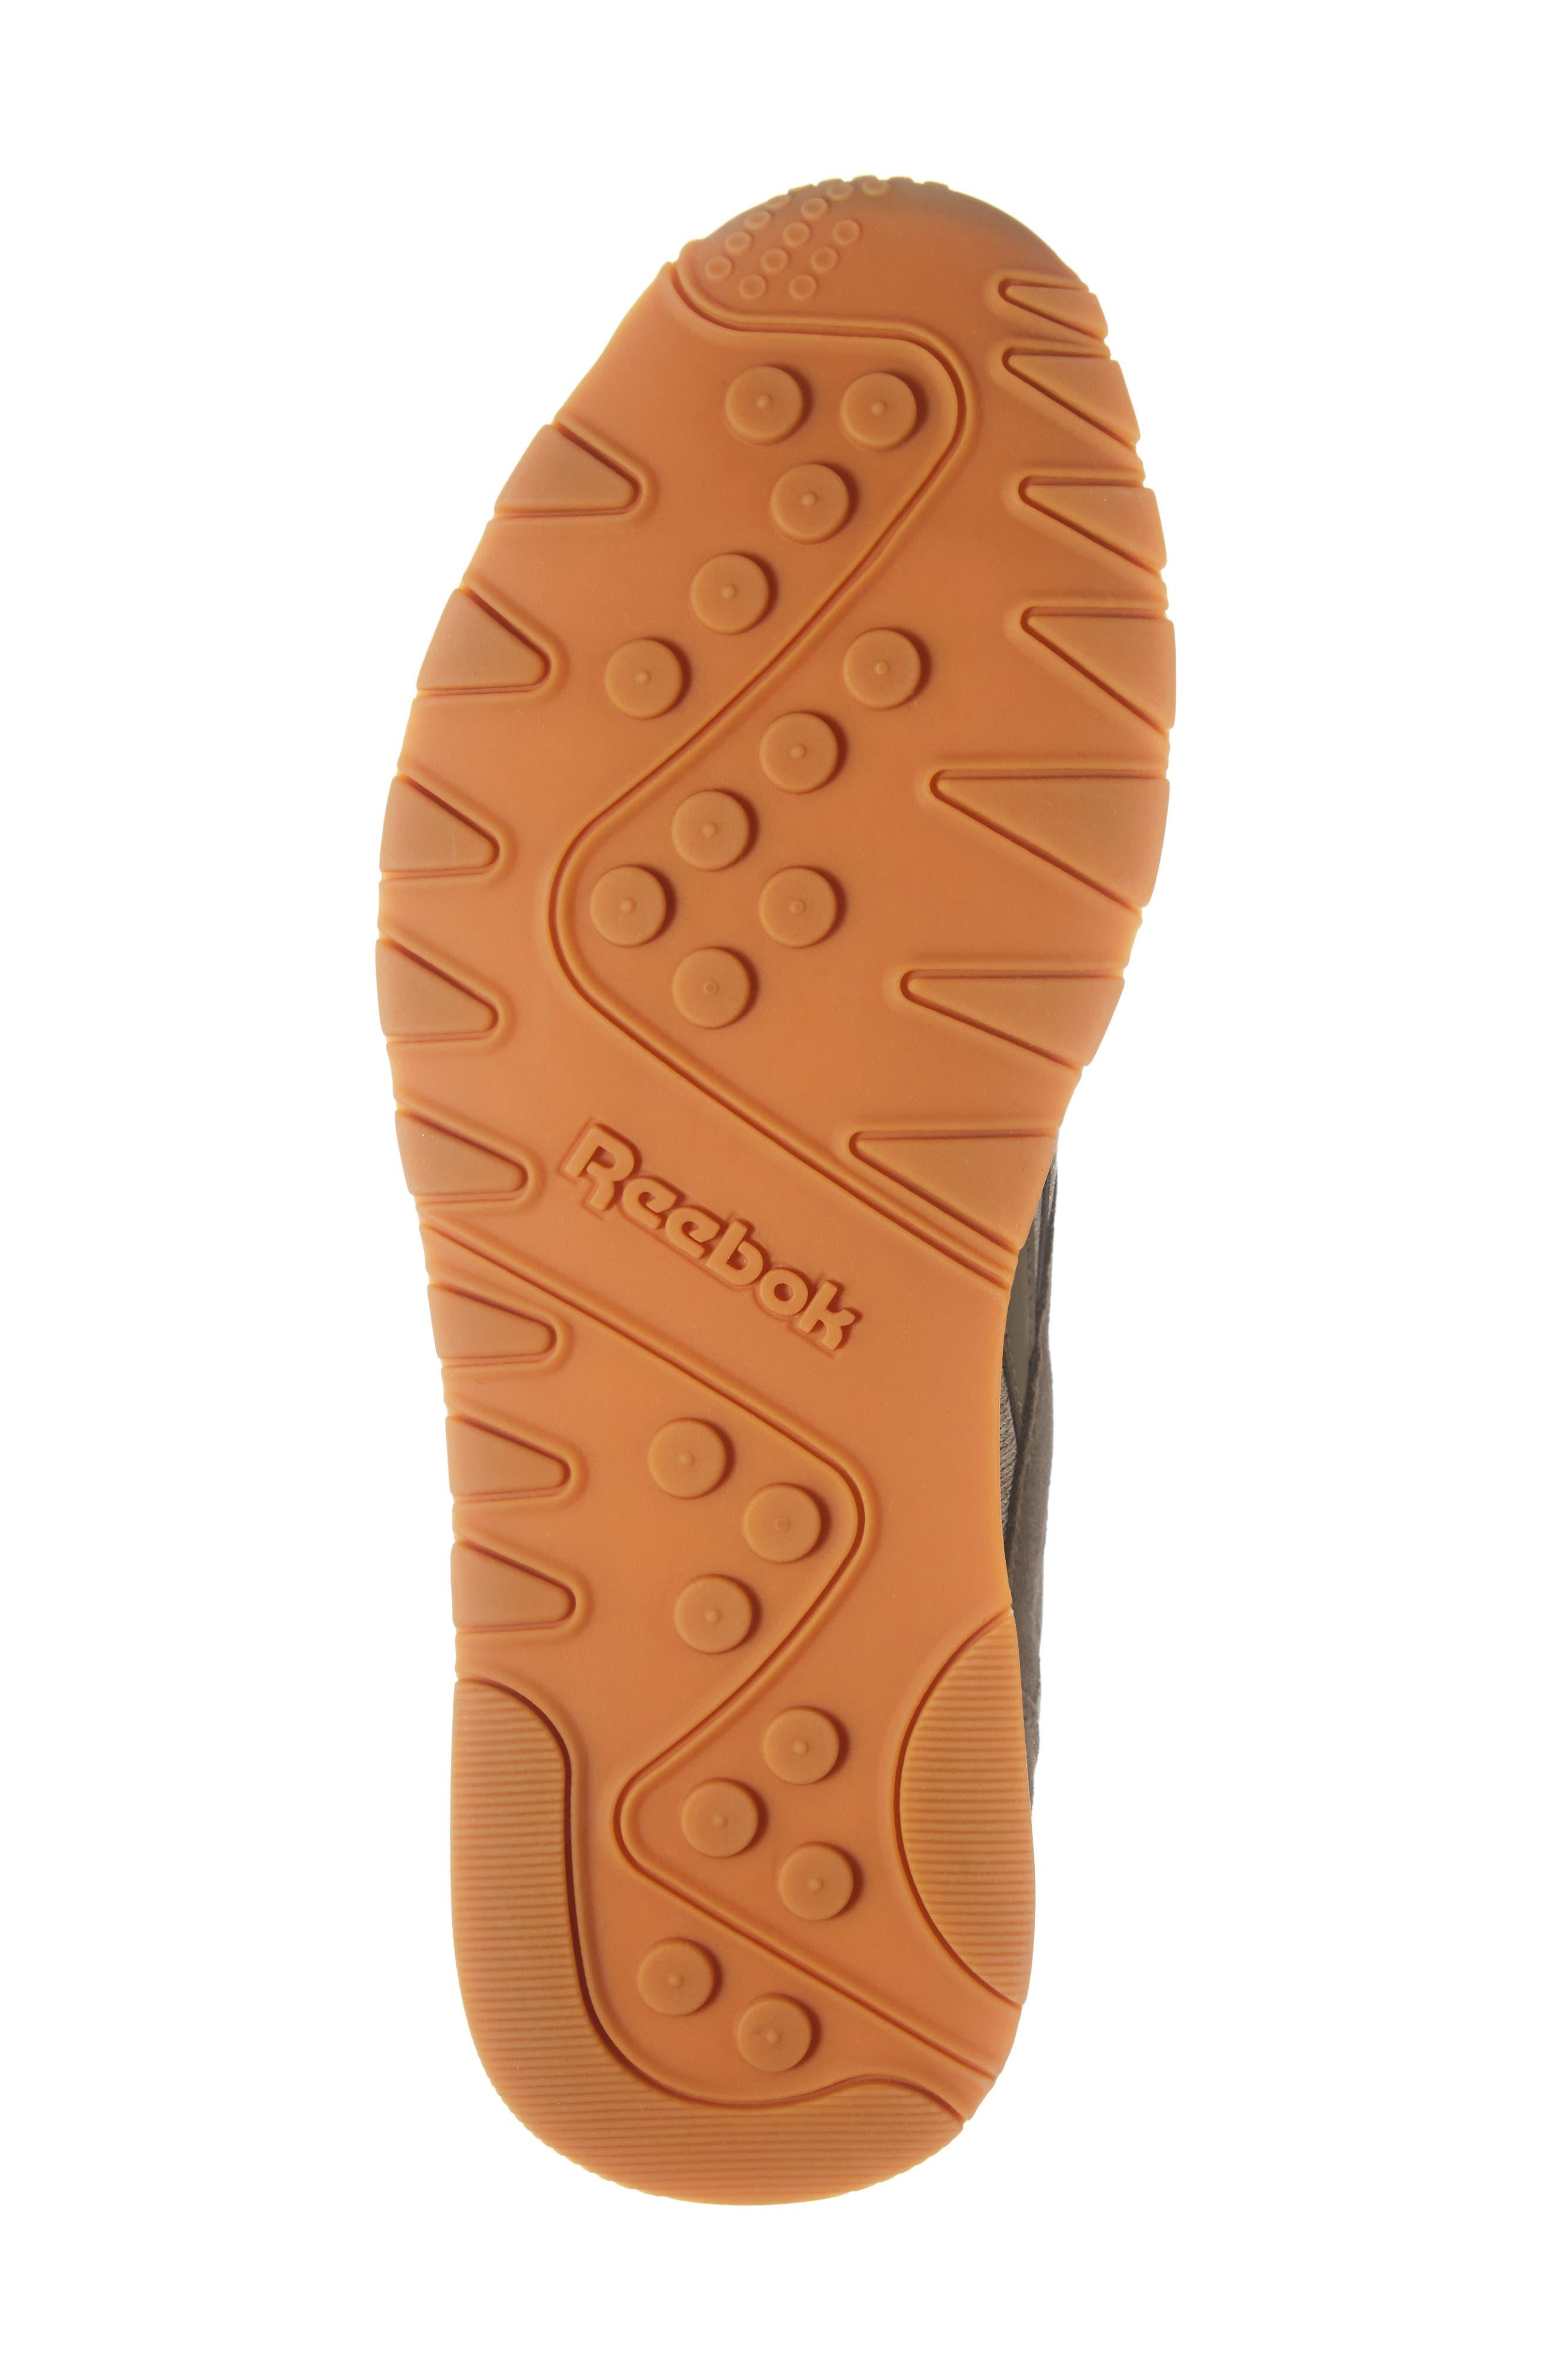 Classic Leather Nylon SG Sneaker,                             Alternate thumbnail 6, color,                             TERRAIN GREY/ CHALK